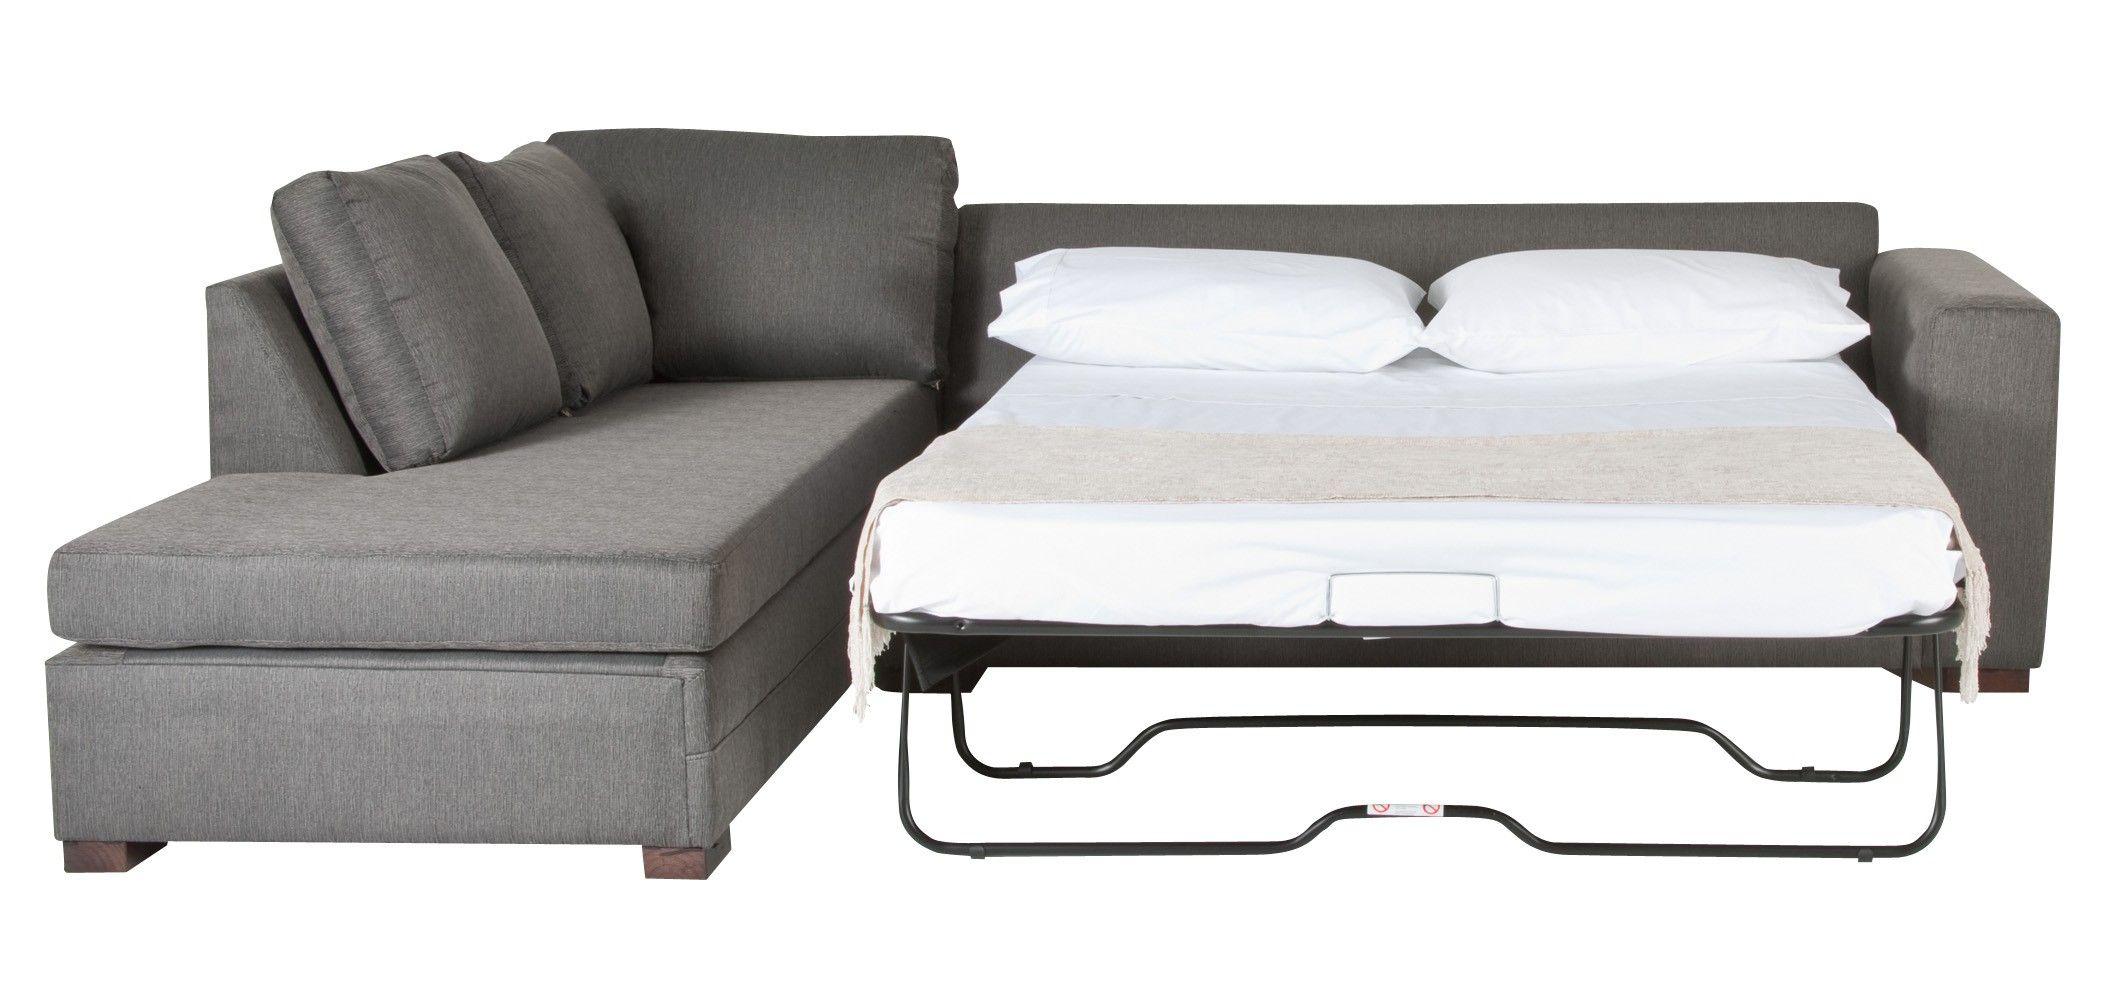 ashley sleeper sofa with chaise www energywarden net ashley sleeper sofas reviews ashley sleeper sofa sale